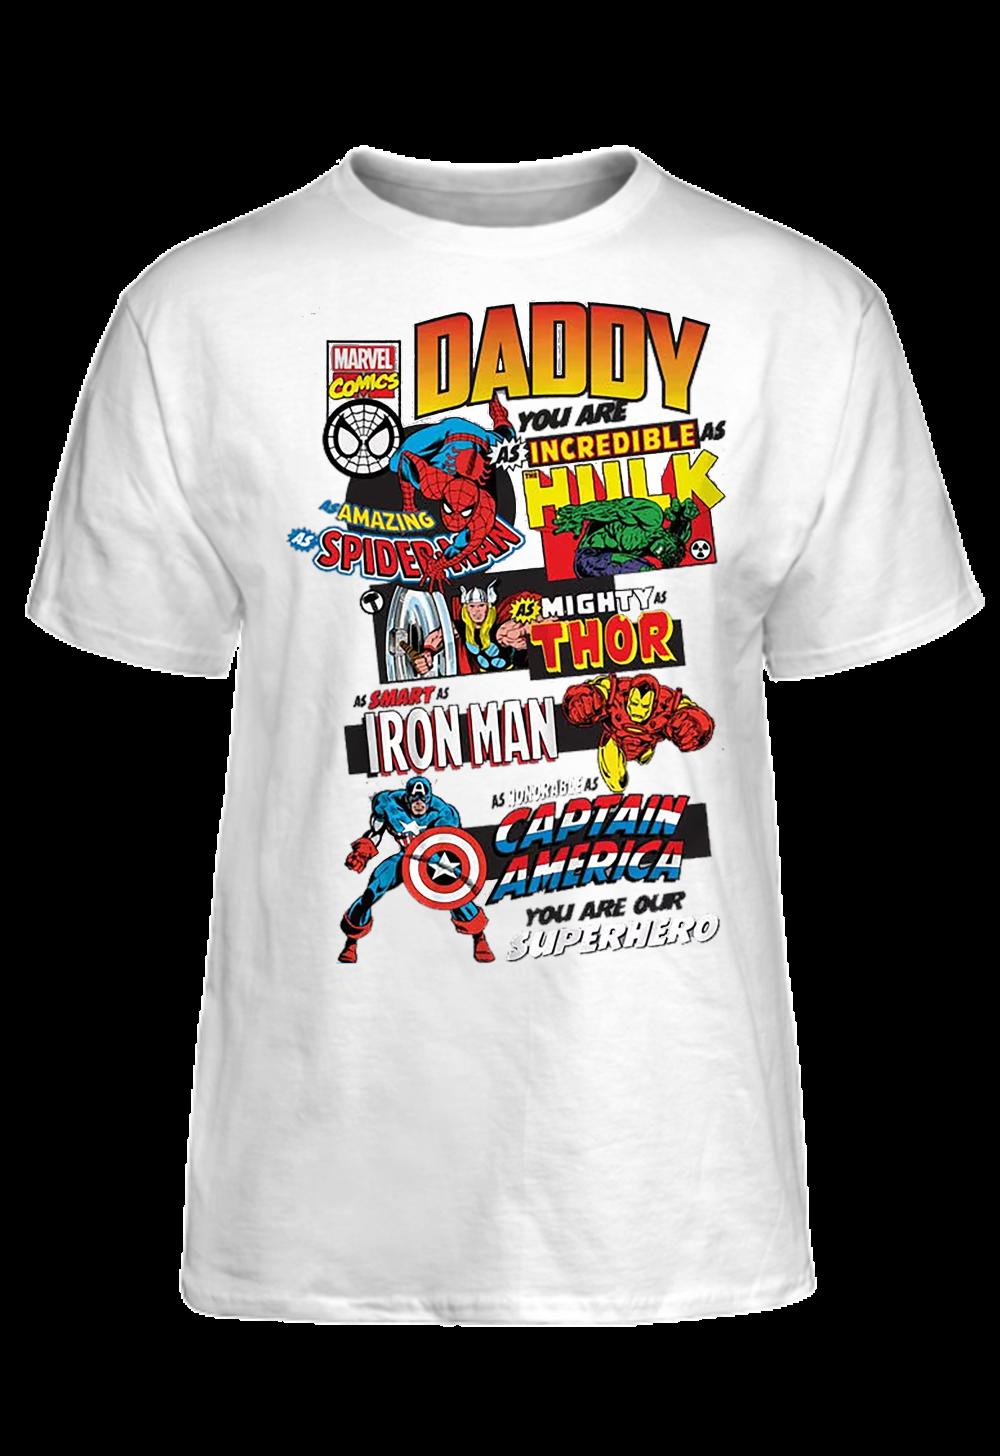 2c5ceb8c Marvel Comics Father's Day T-Shirt Basic Tee | Holiday Decorating ...